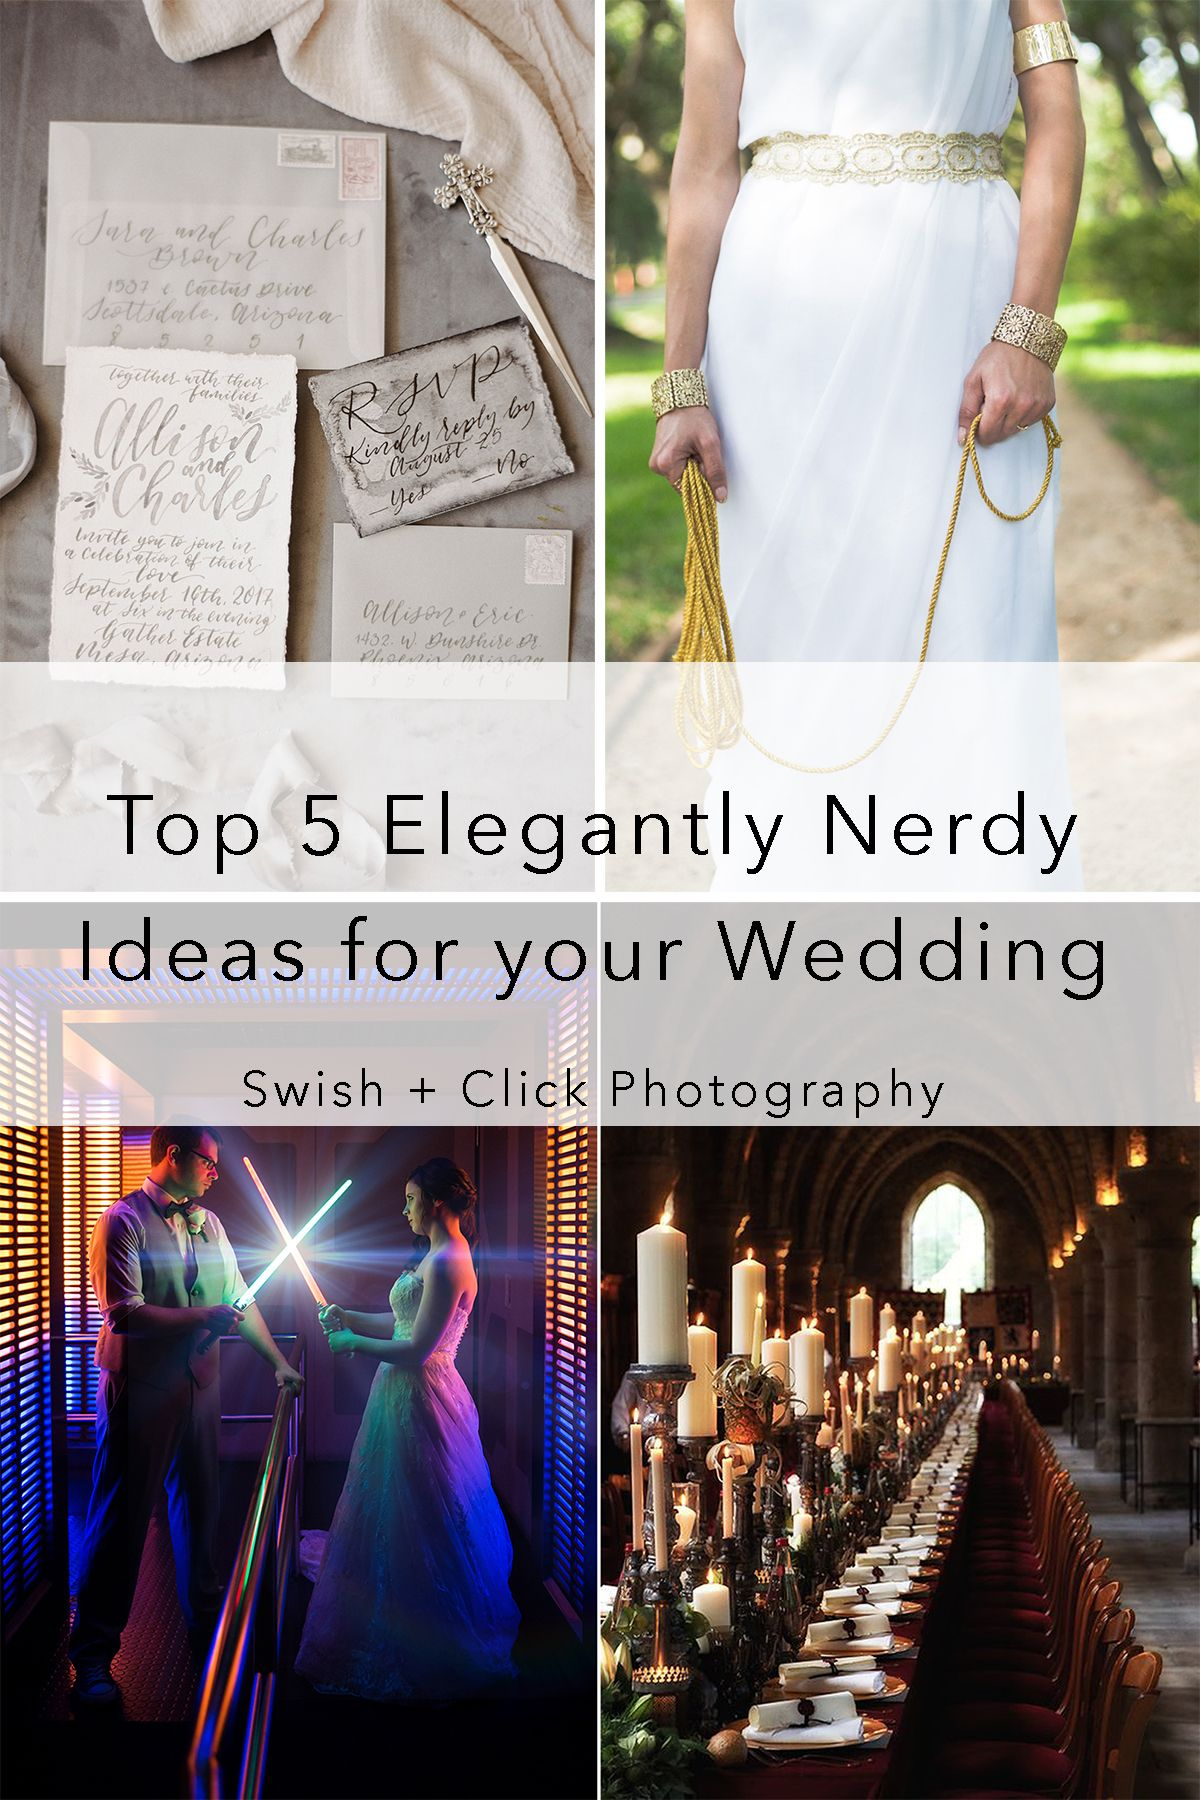 Top 5 Elegantly Nerdy Themes for Your Wedding | Wedding, Wedding ...